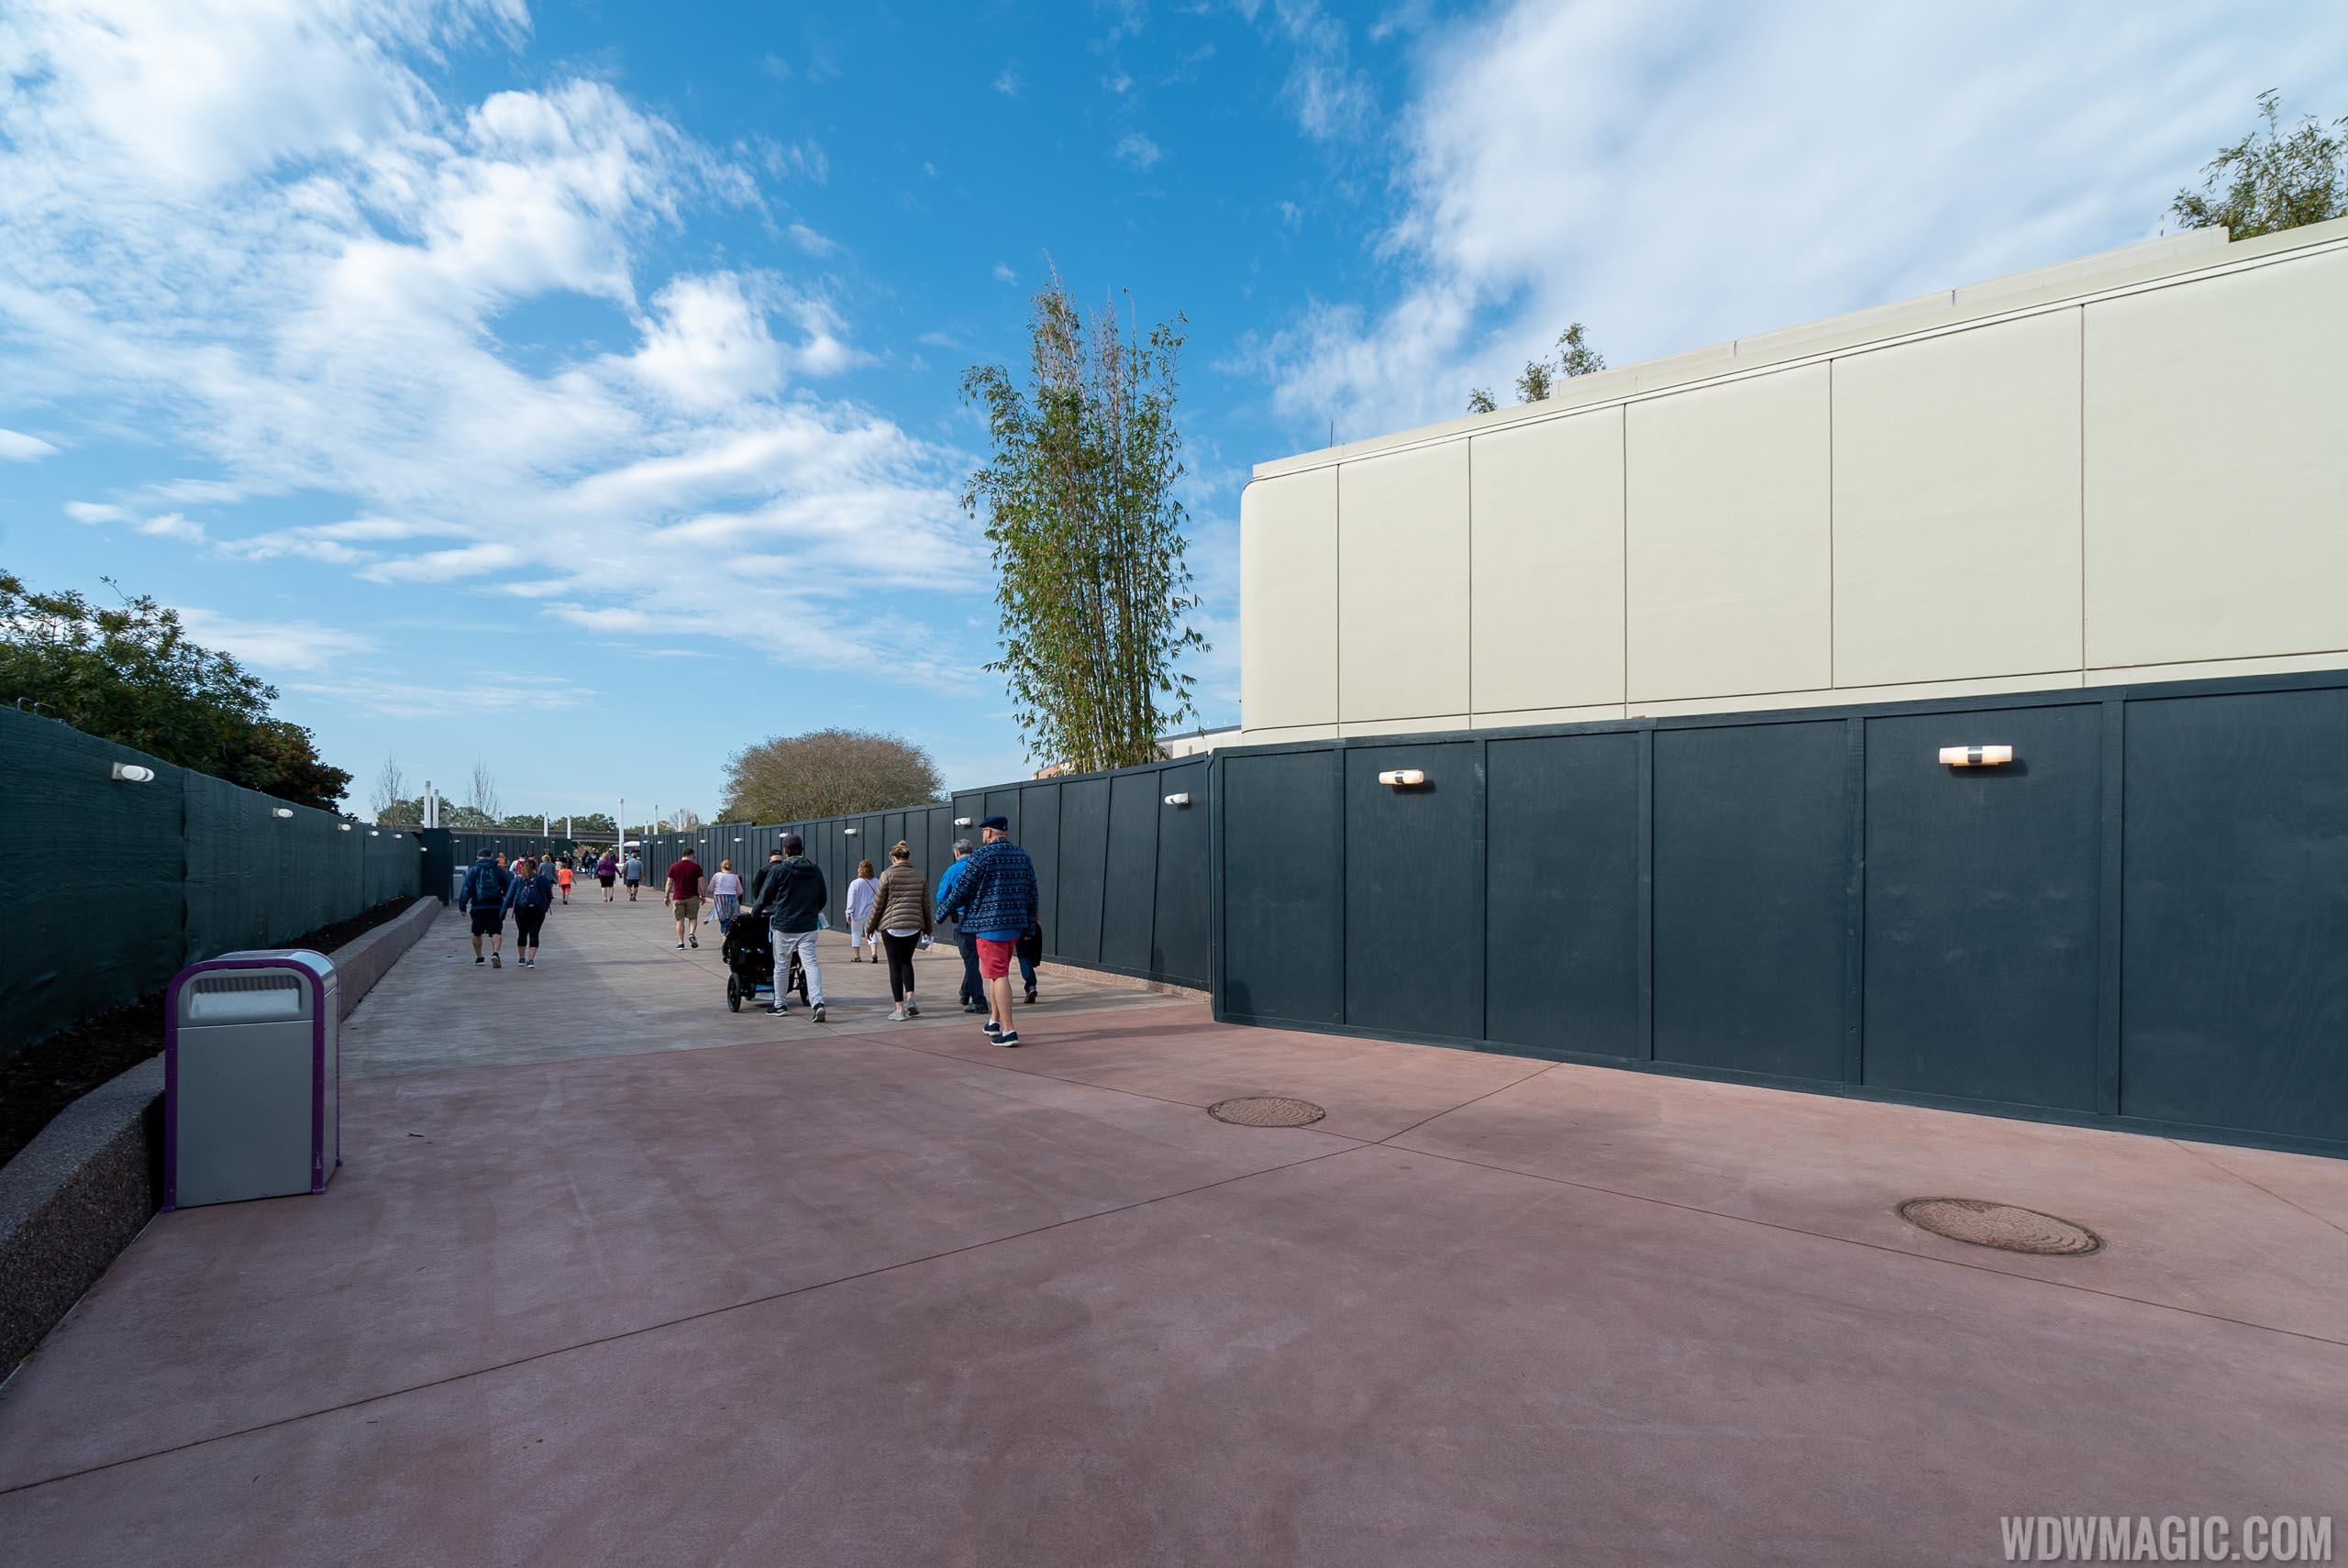 Epcot Future World East Construction Walls - January 2020